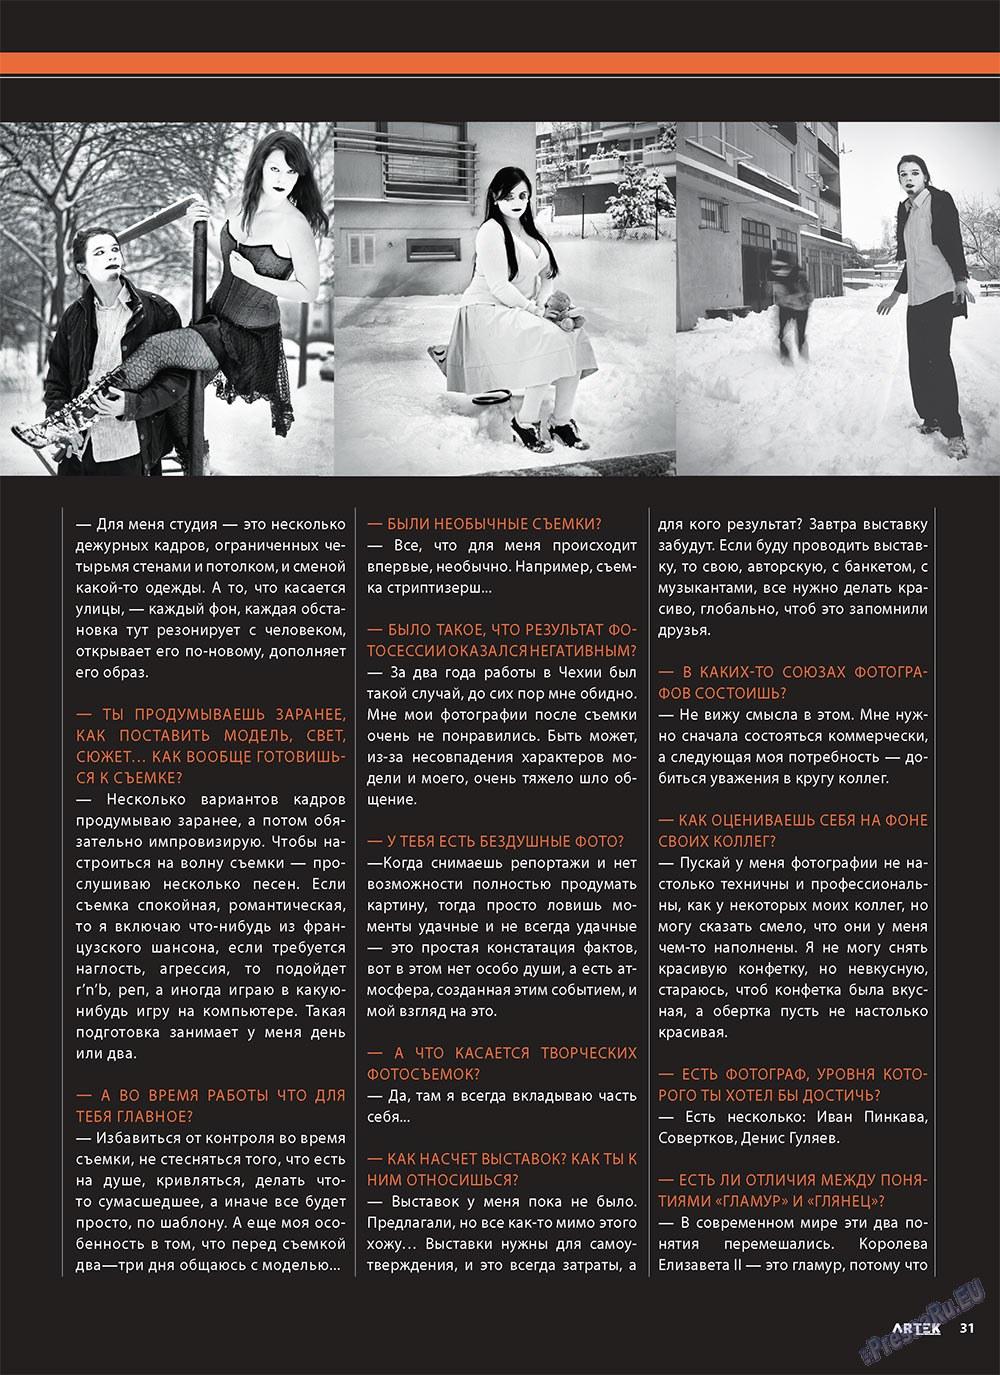 Артек (журнал). 2010 год, номер 6, стр. 33